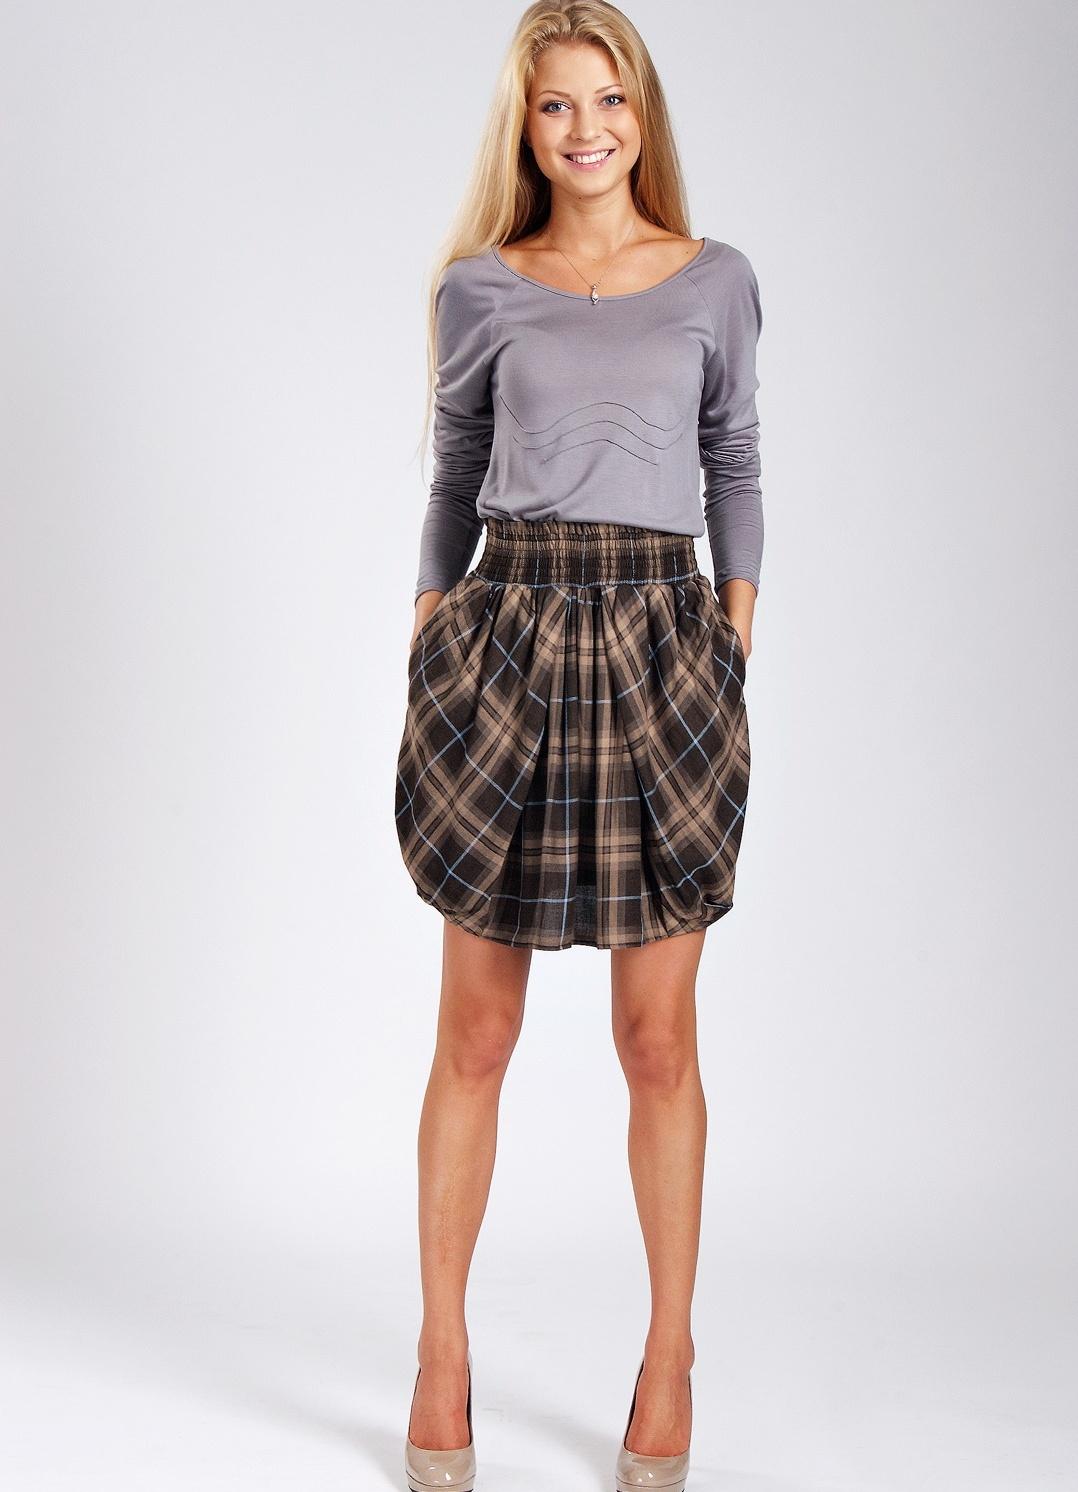 Фасоны юбок для худых девушек